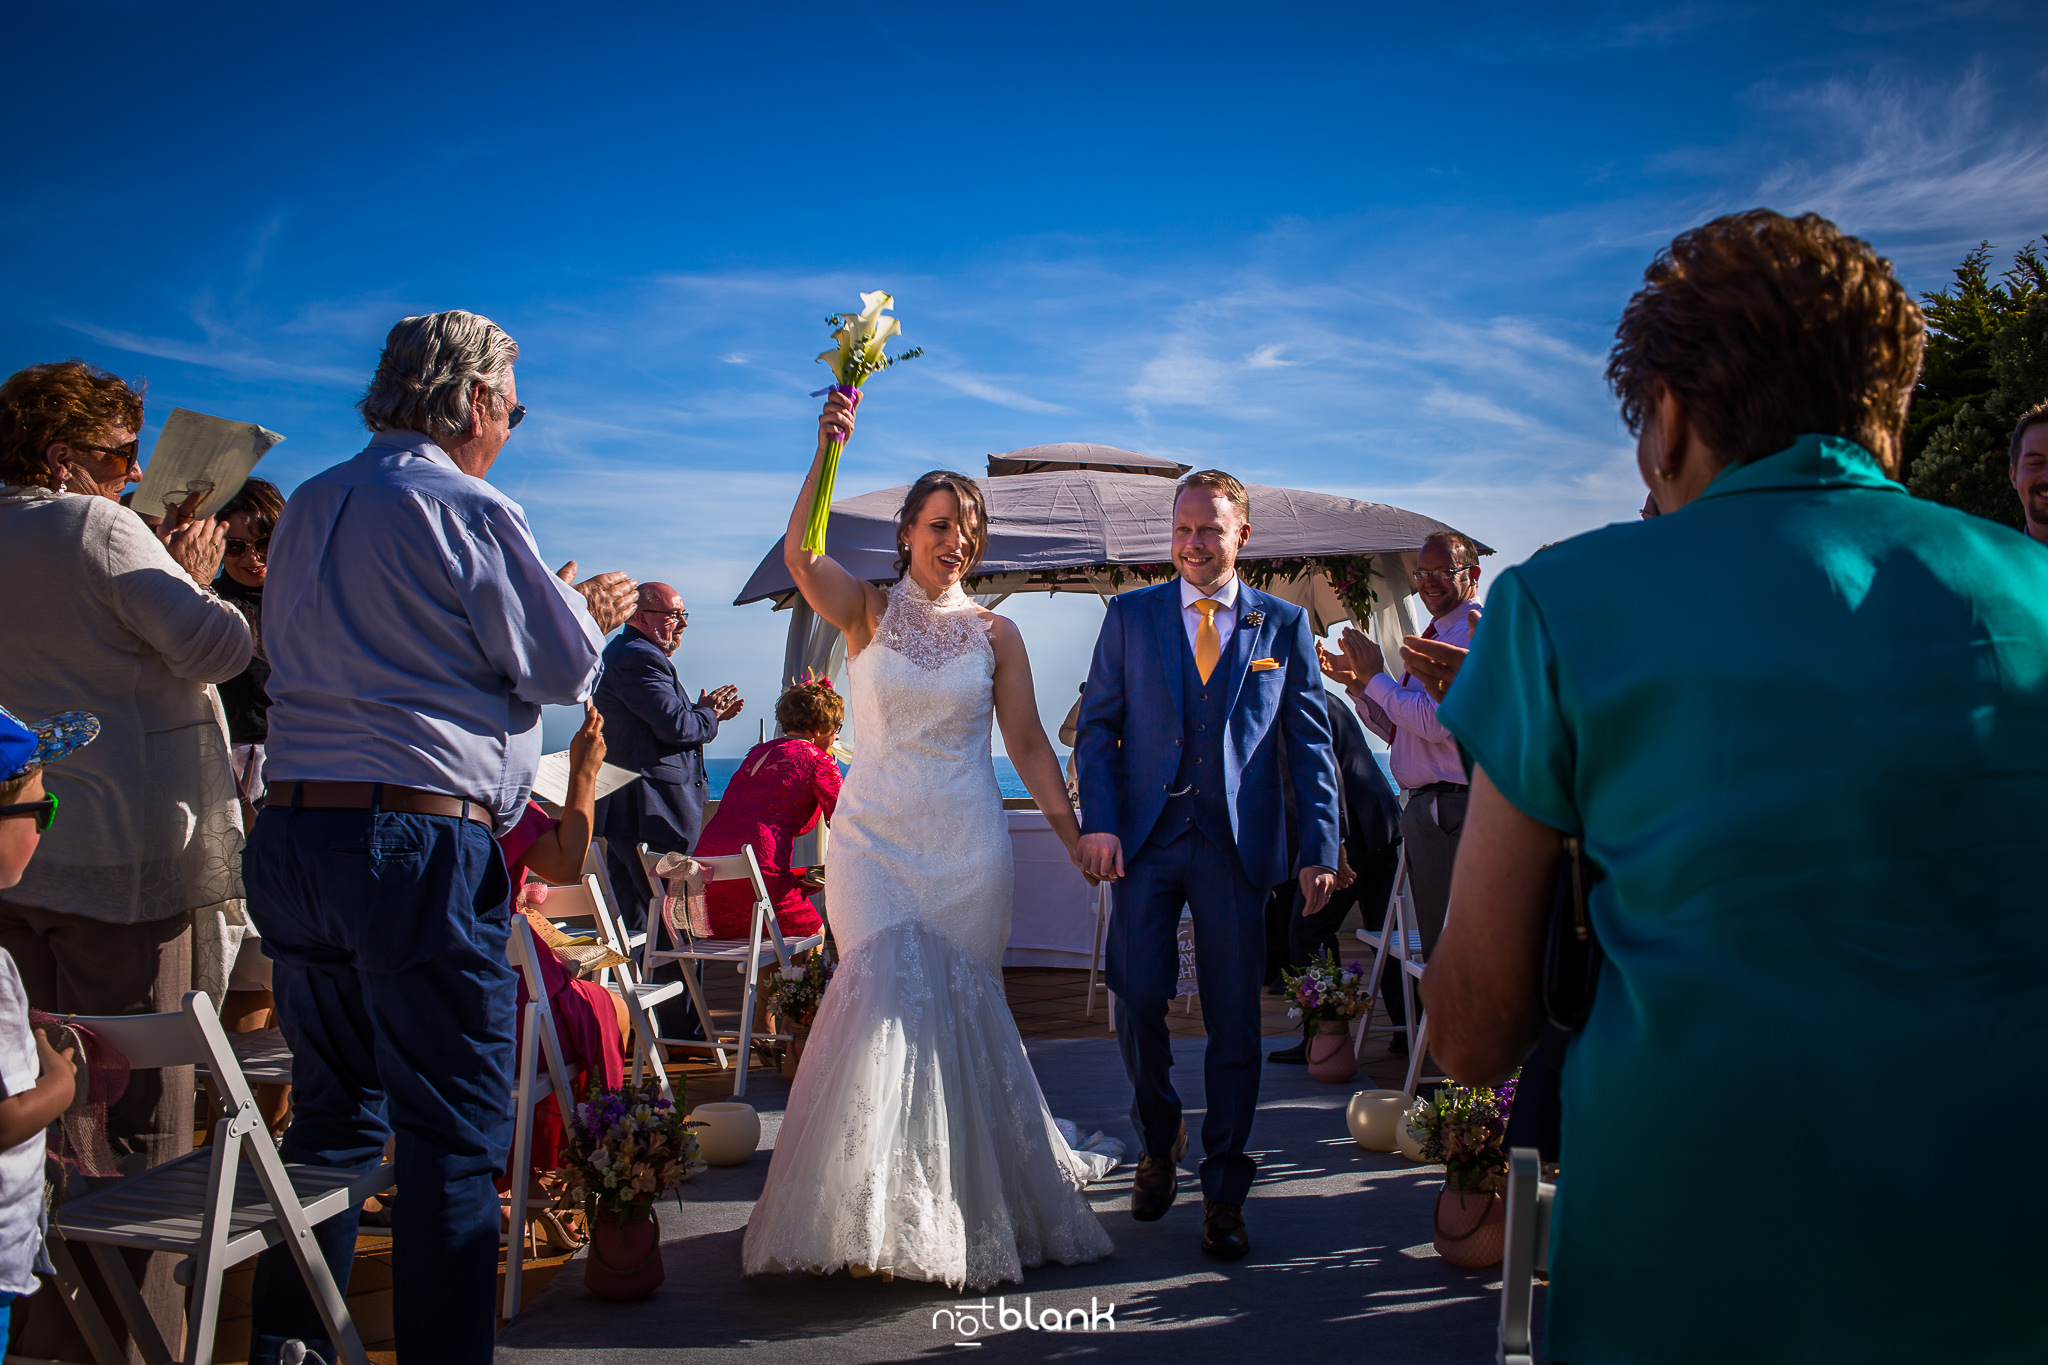 Boda-Maite-David-Pareja-De-Novios-Ceremonia-Civil-Talaso-Atlantico. Reportaje realizado por Notblank fotógrafos de boda